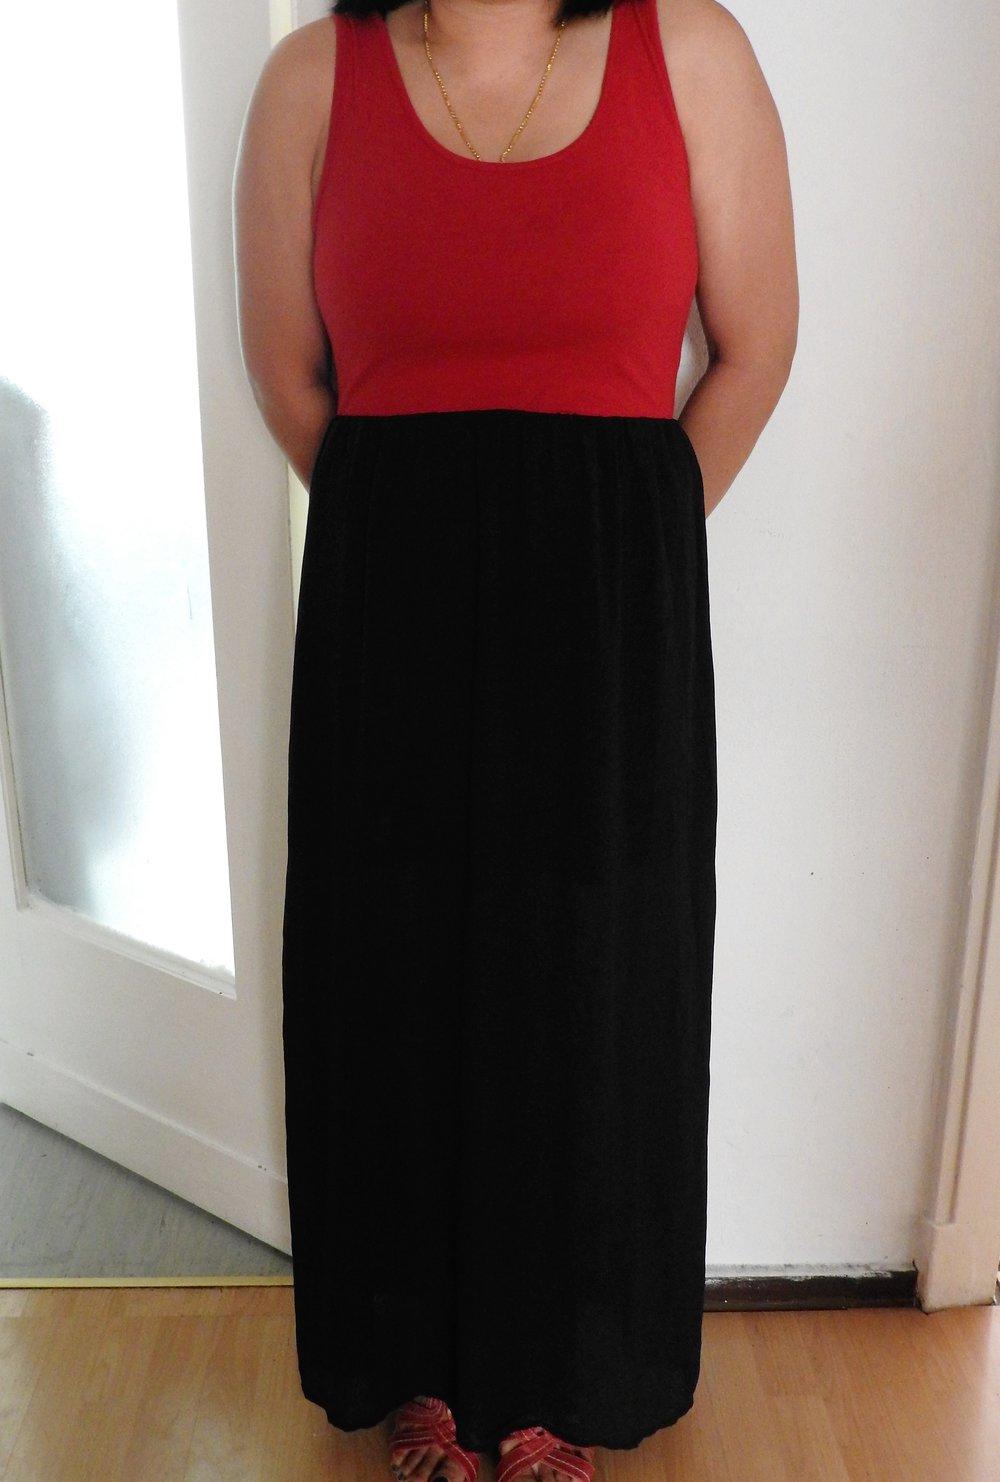 Amisu langes rot-schwarzes Kleid :: Kleiderkorb.de